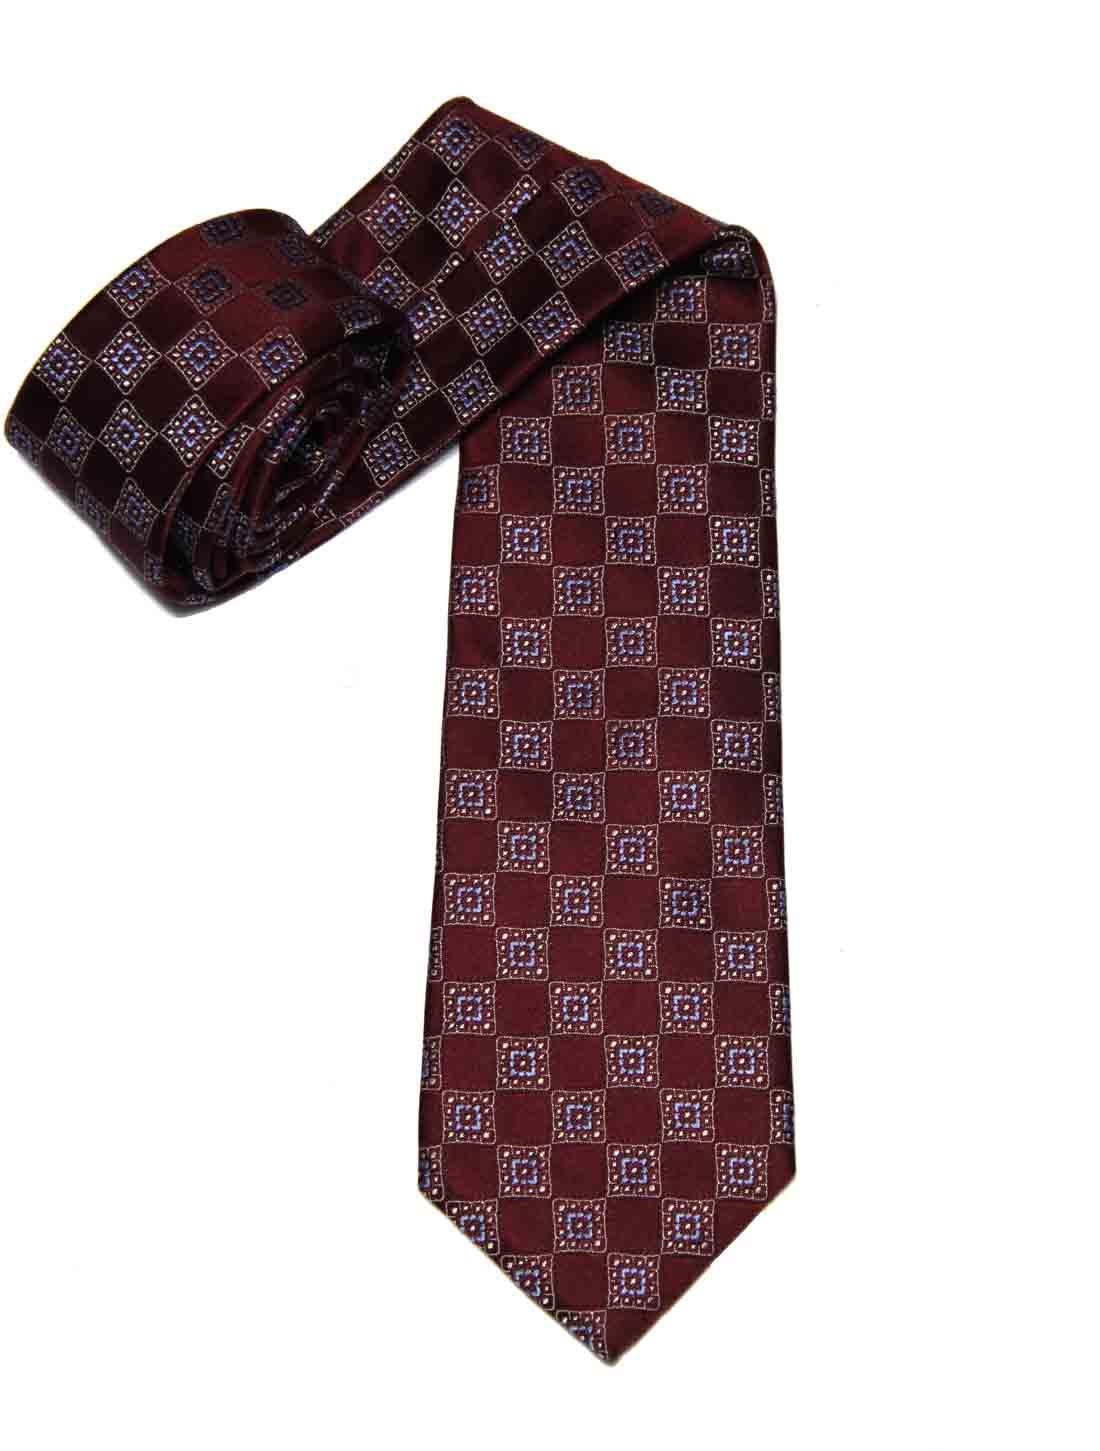 Brooks Brothers Tie Silk Red Blue White Geometric Men's